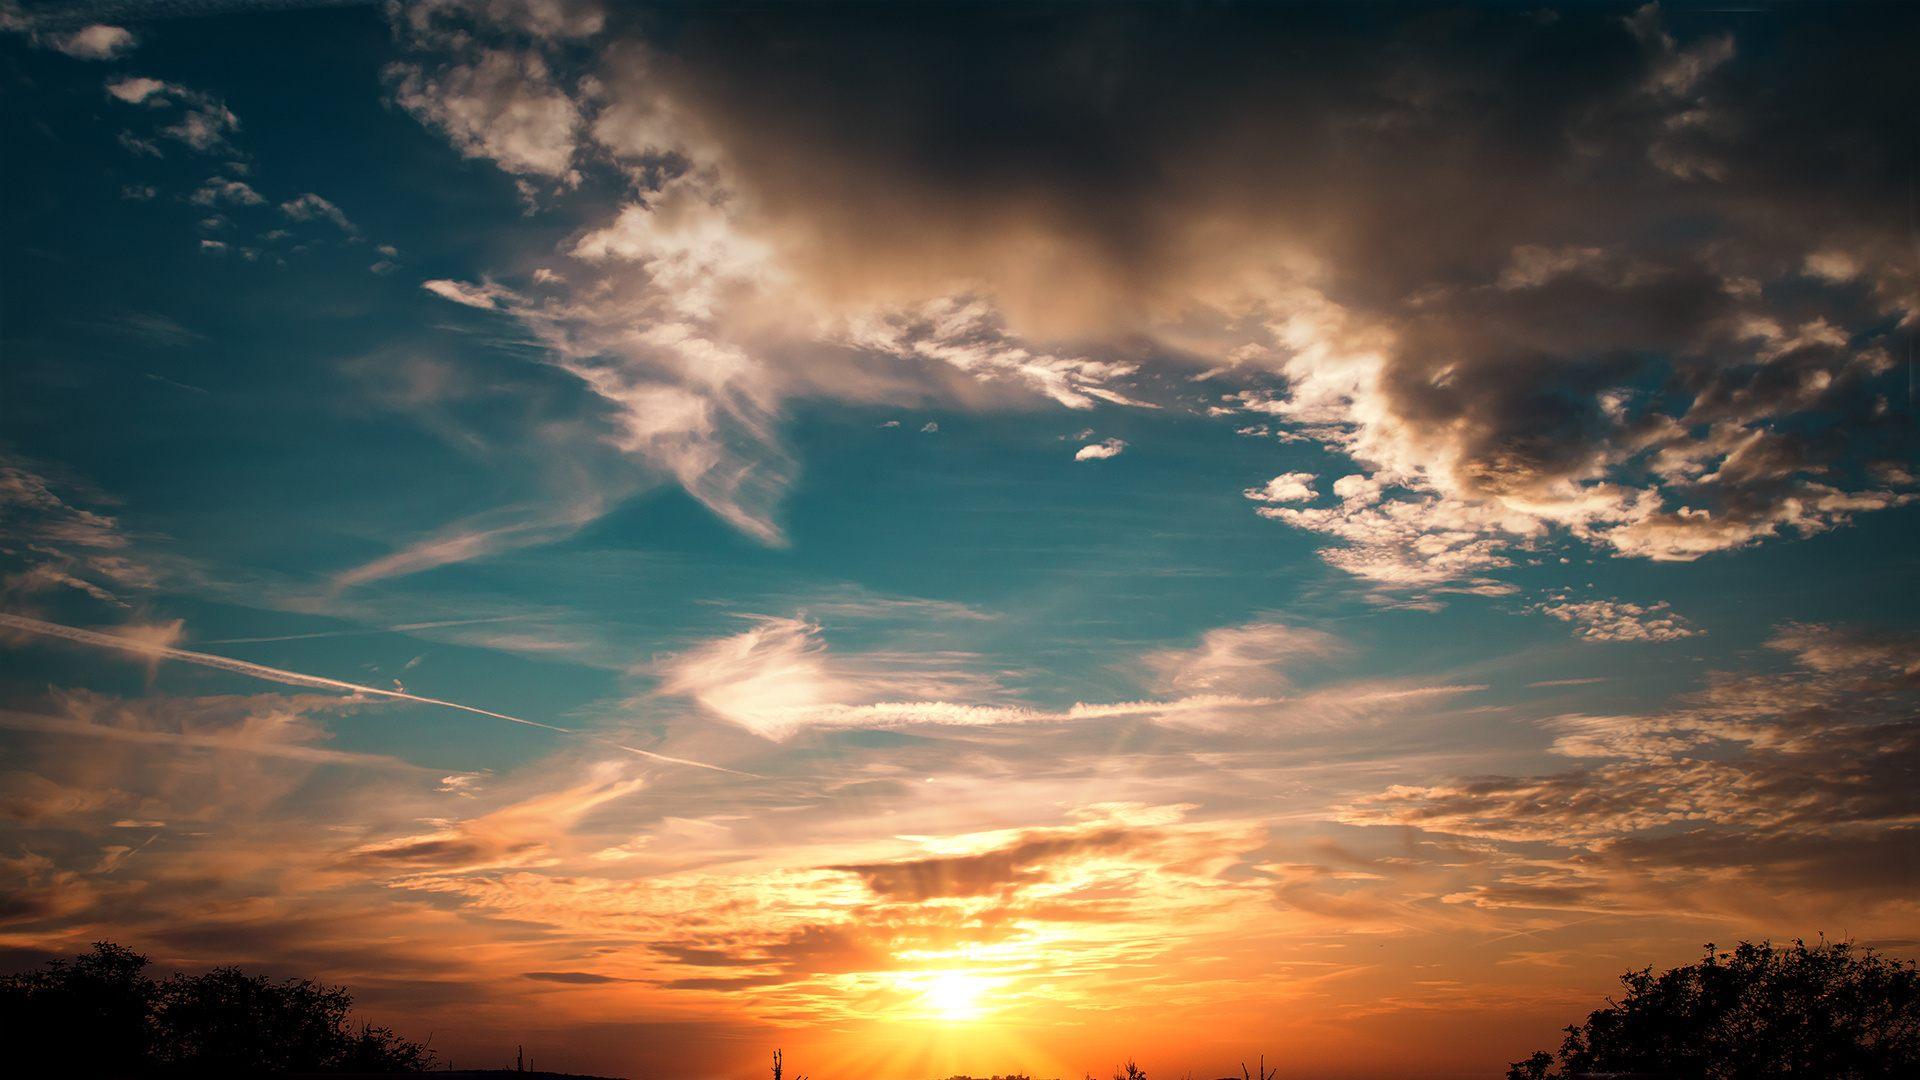 закат солнце облака  № 3852041  скачать